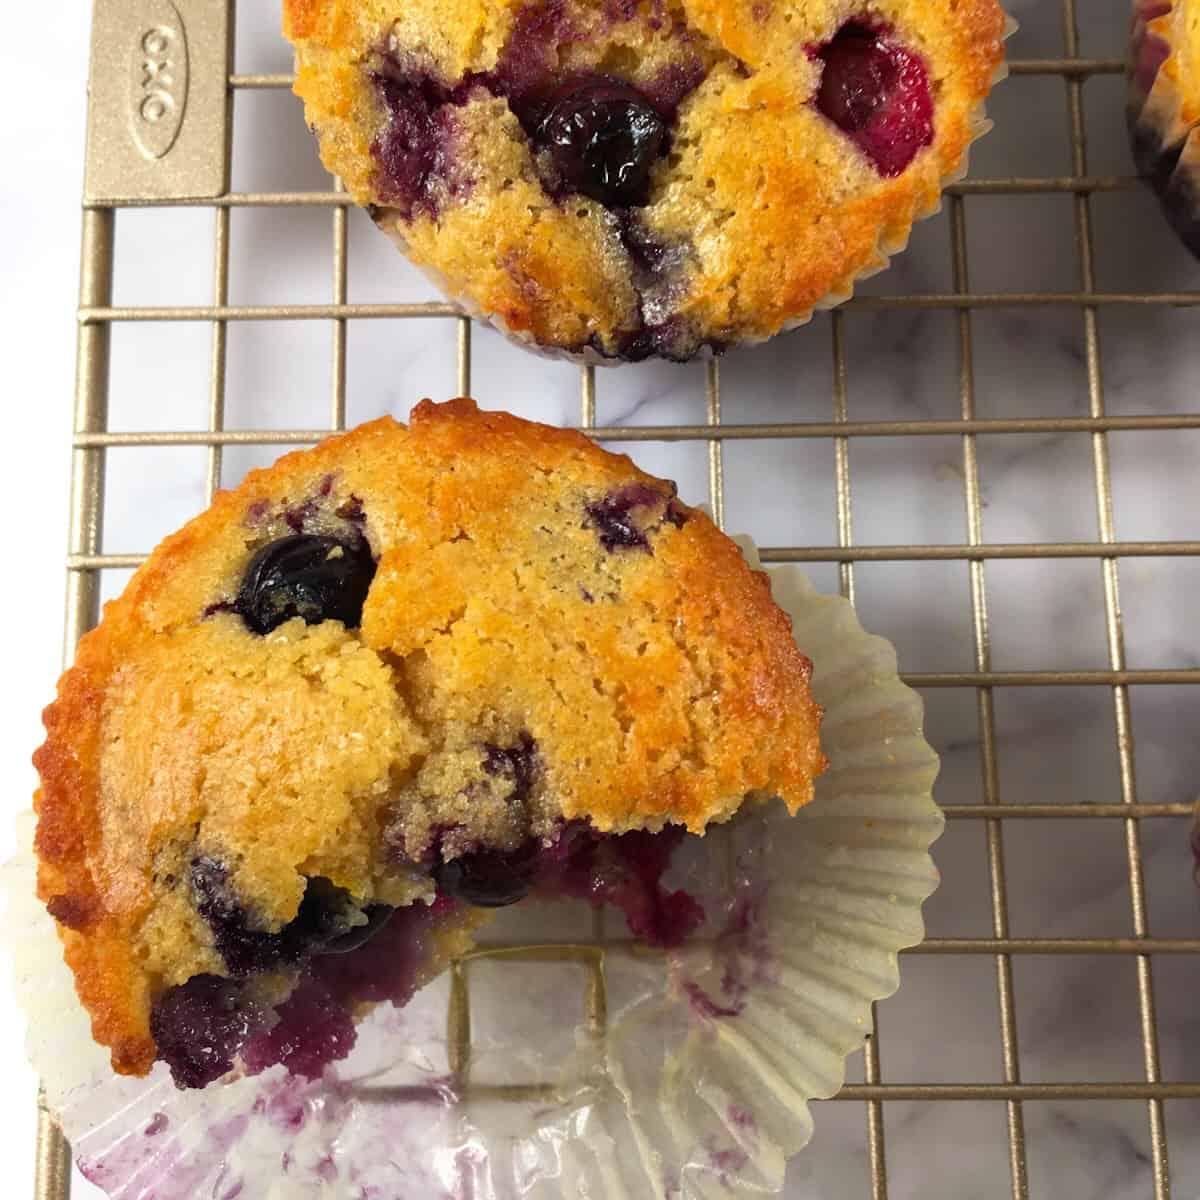 kodiak cakes blueberry muffins